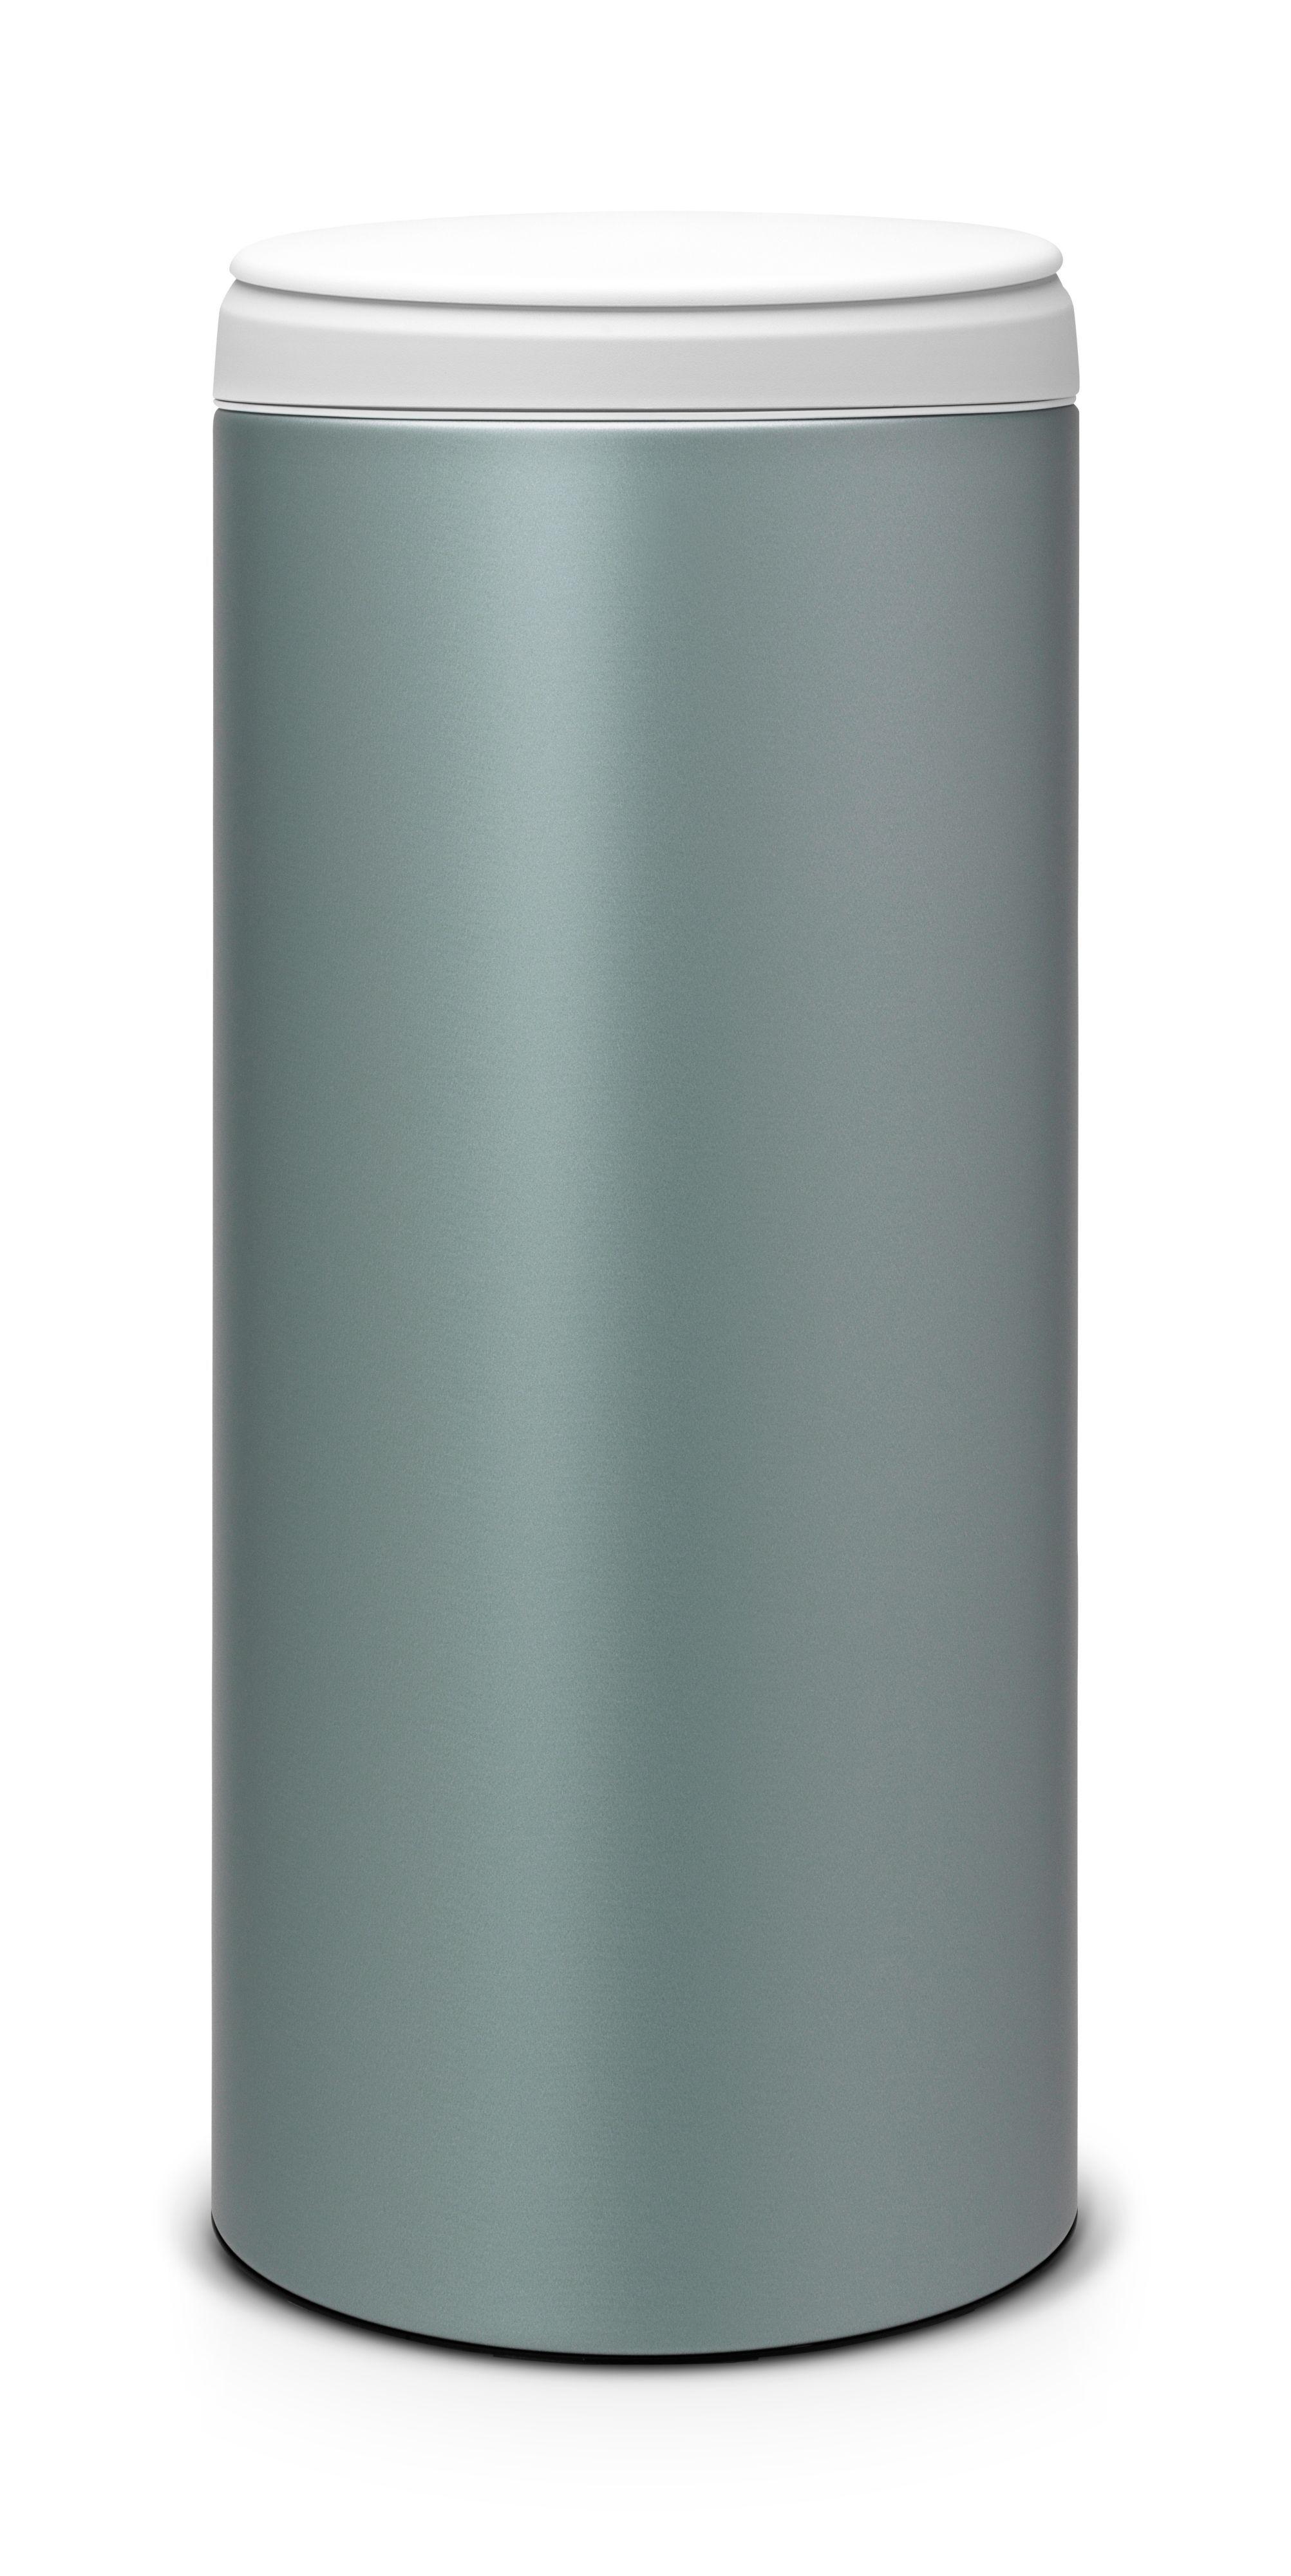 Brabantia Metallic Mint Metal Round Flip Top Kitchen Bin, 30L ...